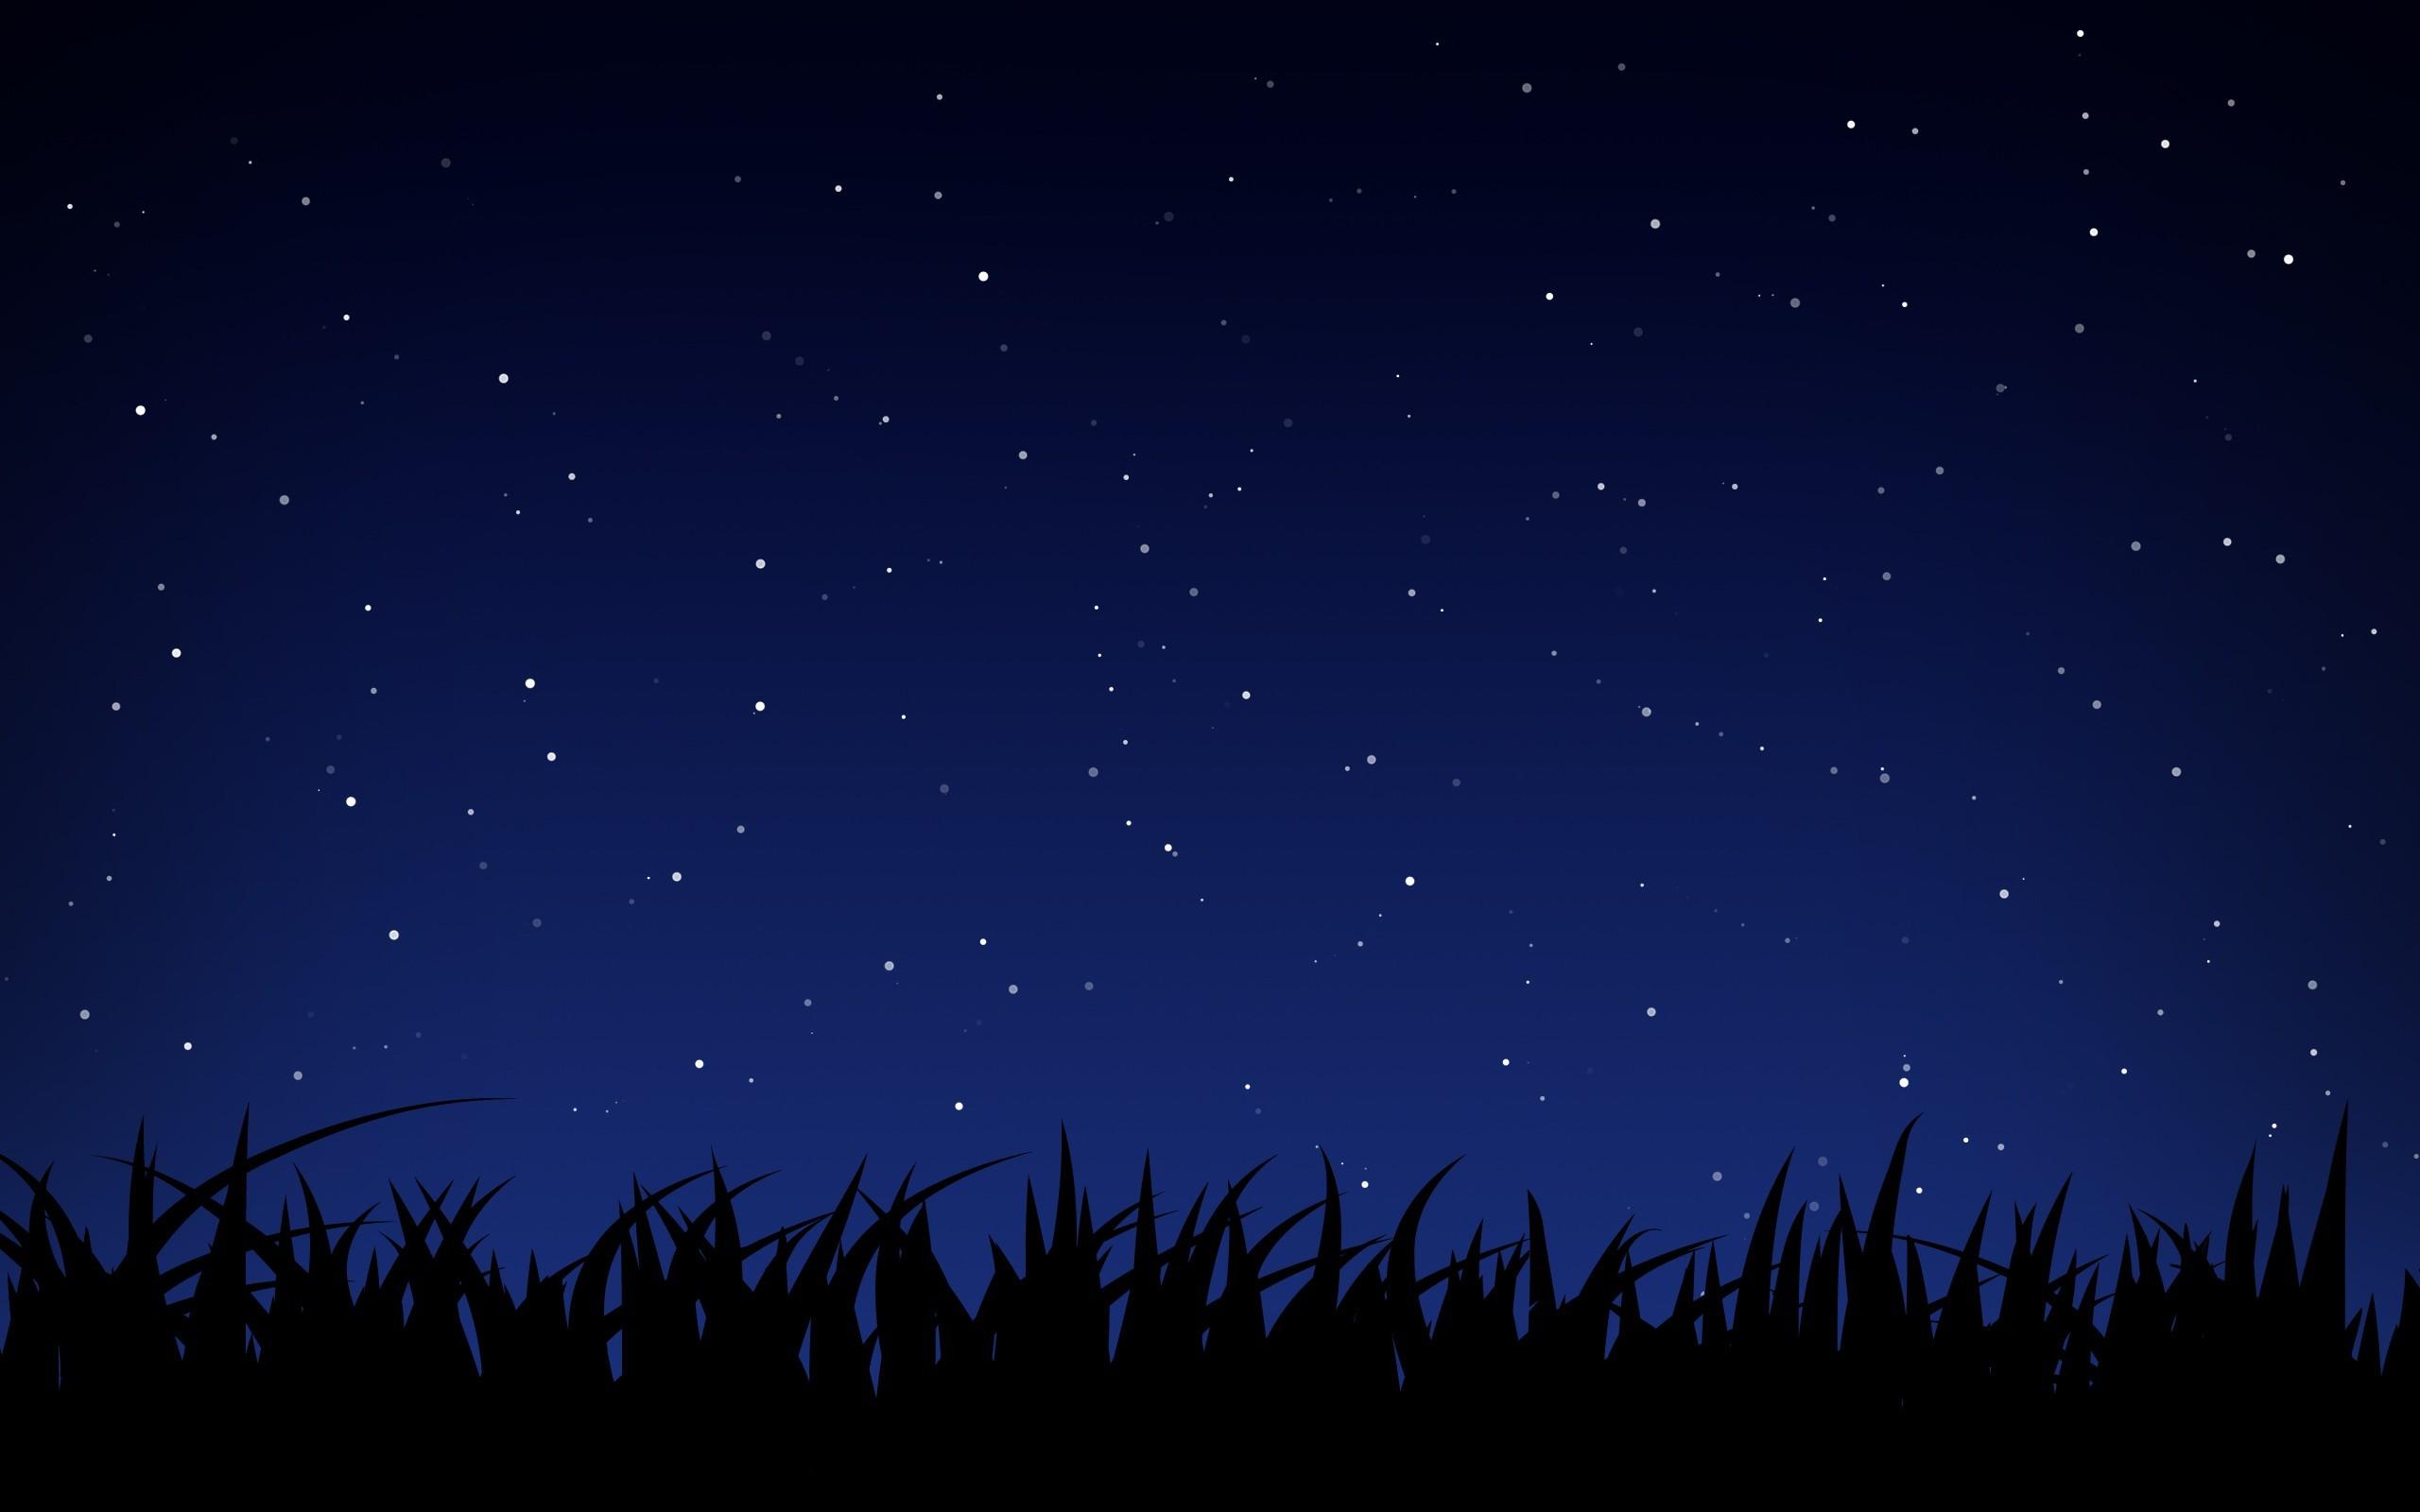 931b34b51eac740f65c5029bbf6dc28a_night-sky-vector-wallpaper-night-sky -sunset-background-